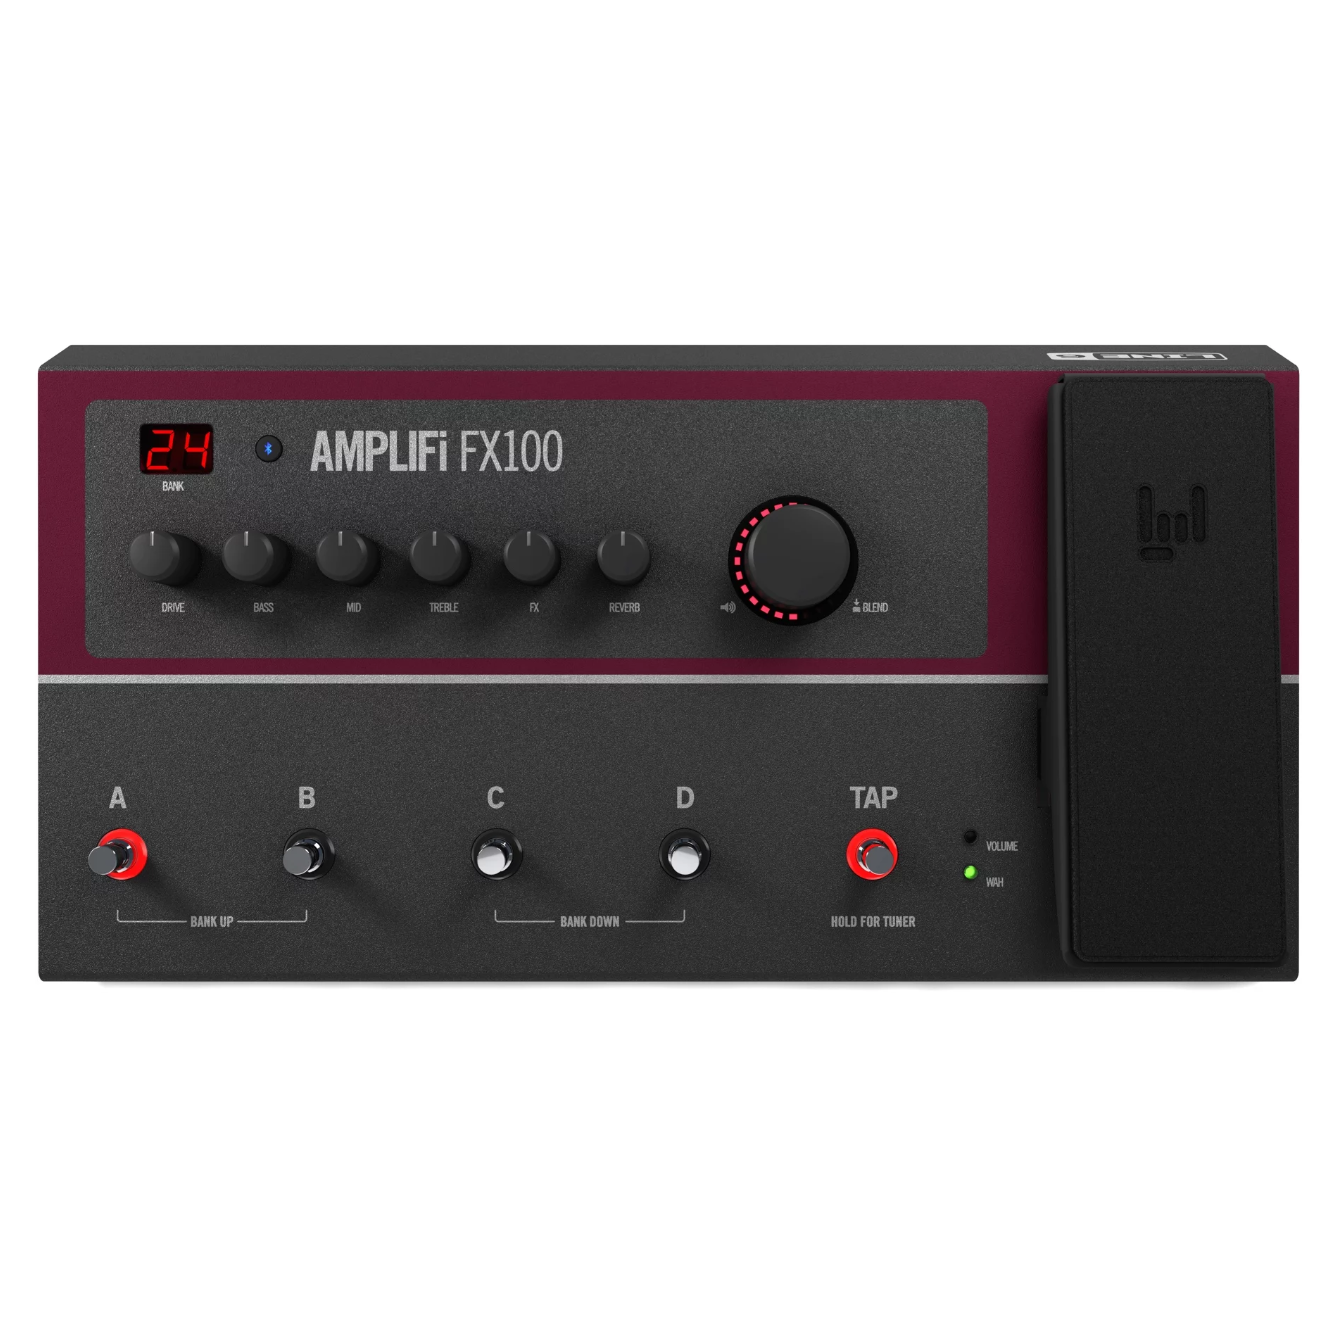 Line 6 AMPLIFi FX100 ToneMatching Amp / Effects Modeler Floorboard (LINE6)